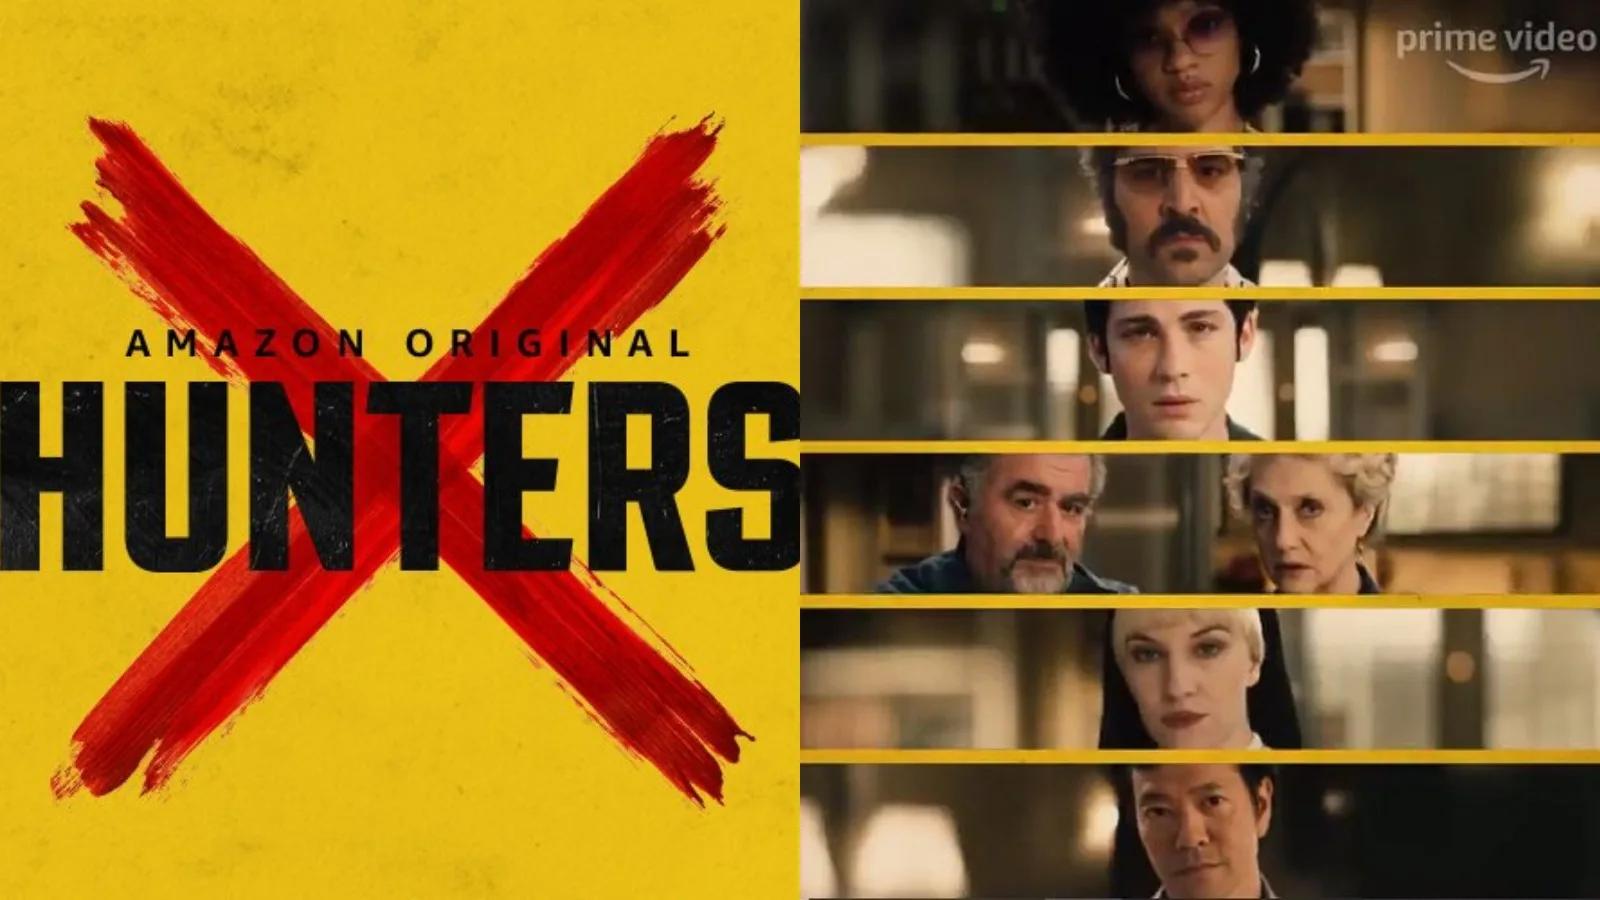 Hunters de Jordan Peele y Amazon libera nuevo teaser